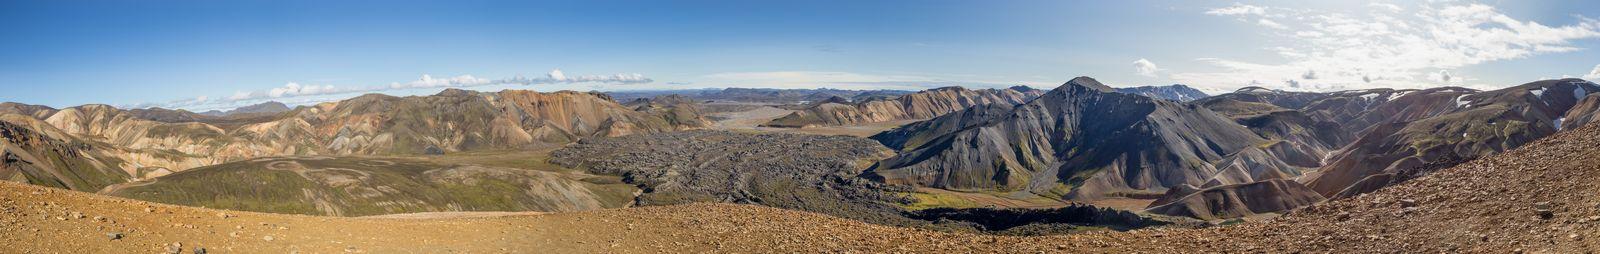 360 grados de maravillas volcánicas